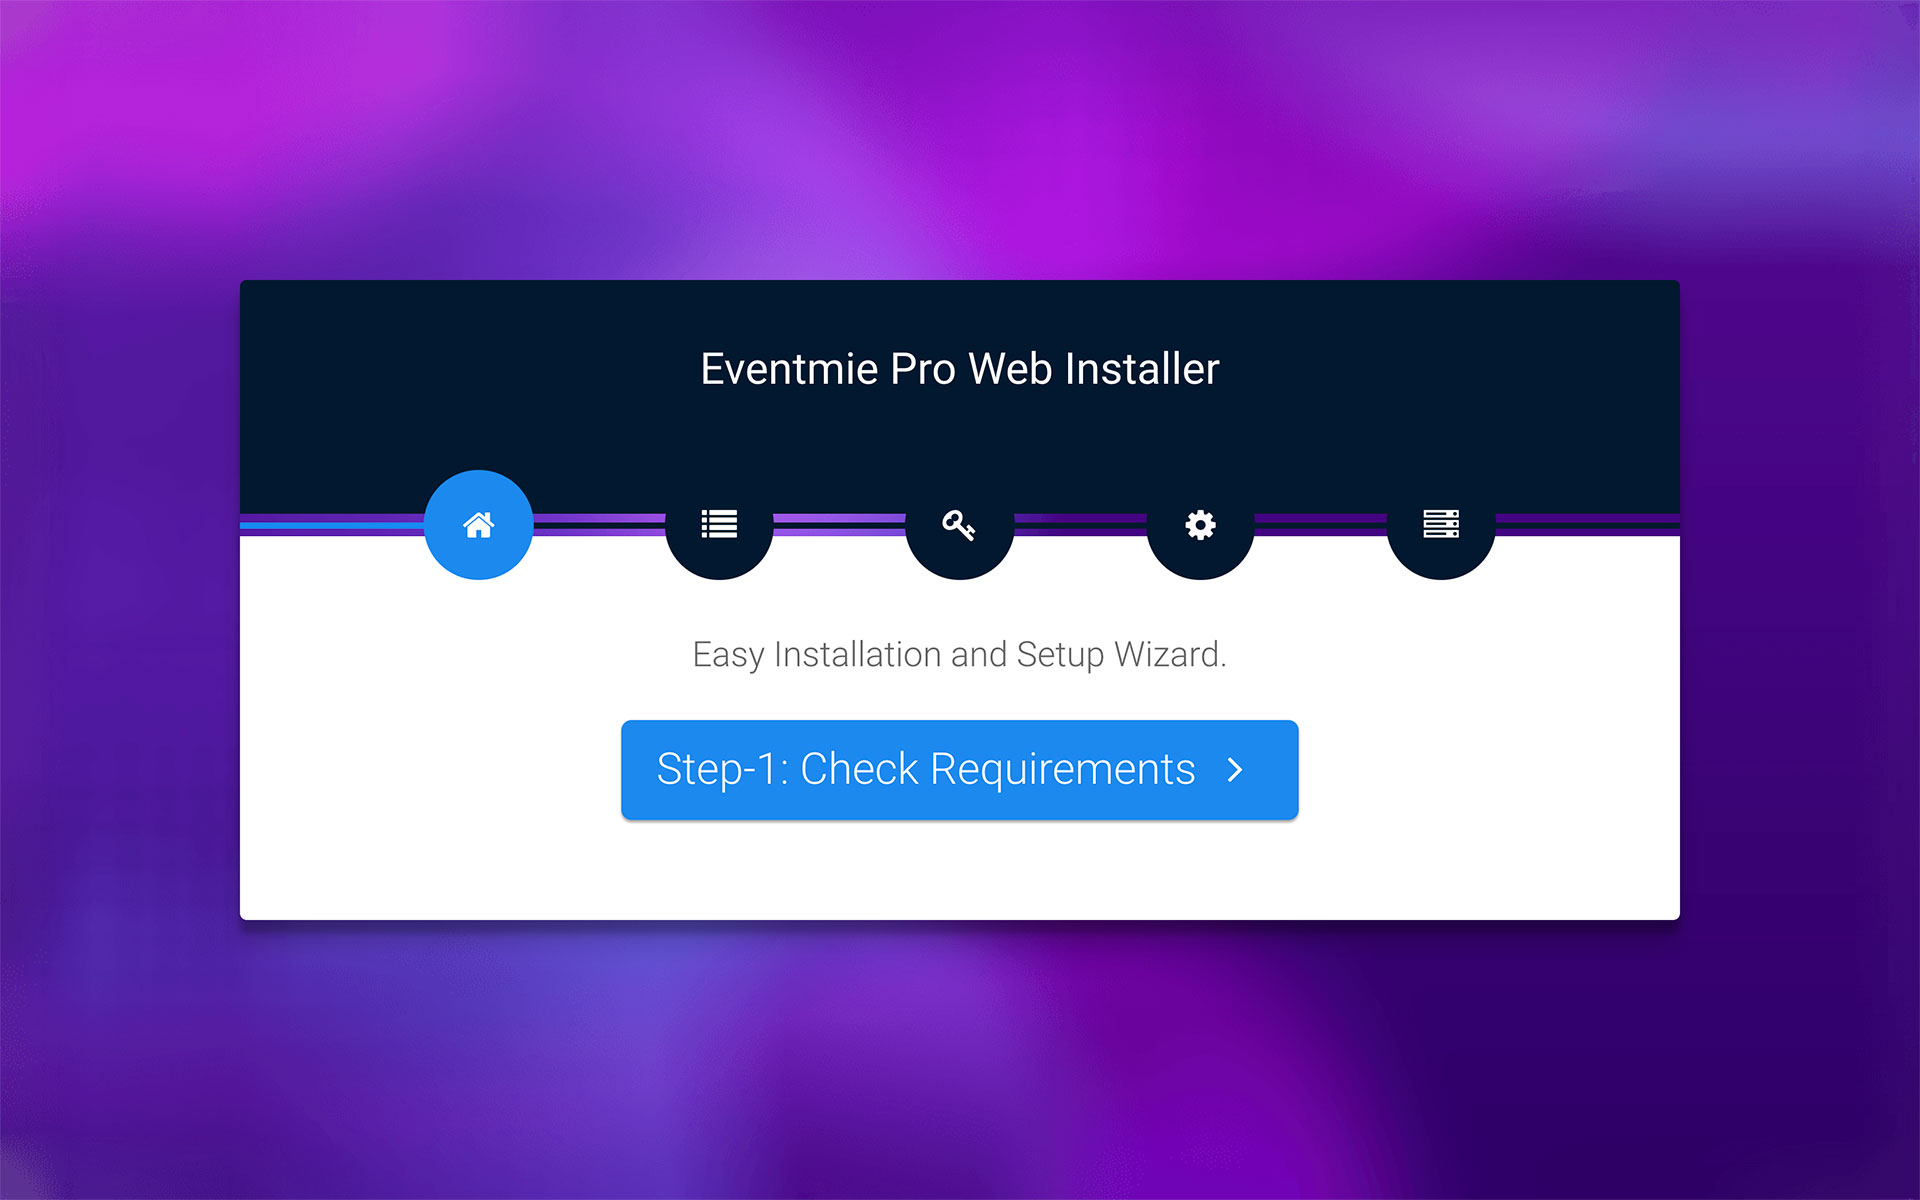 Eventmie Web Installer